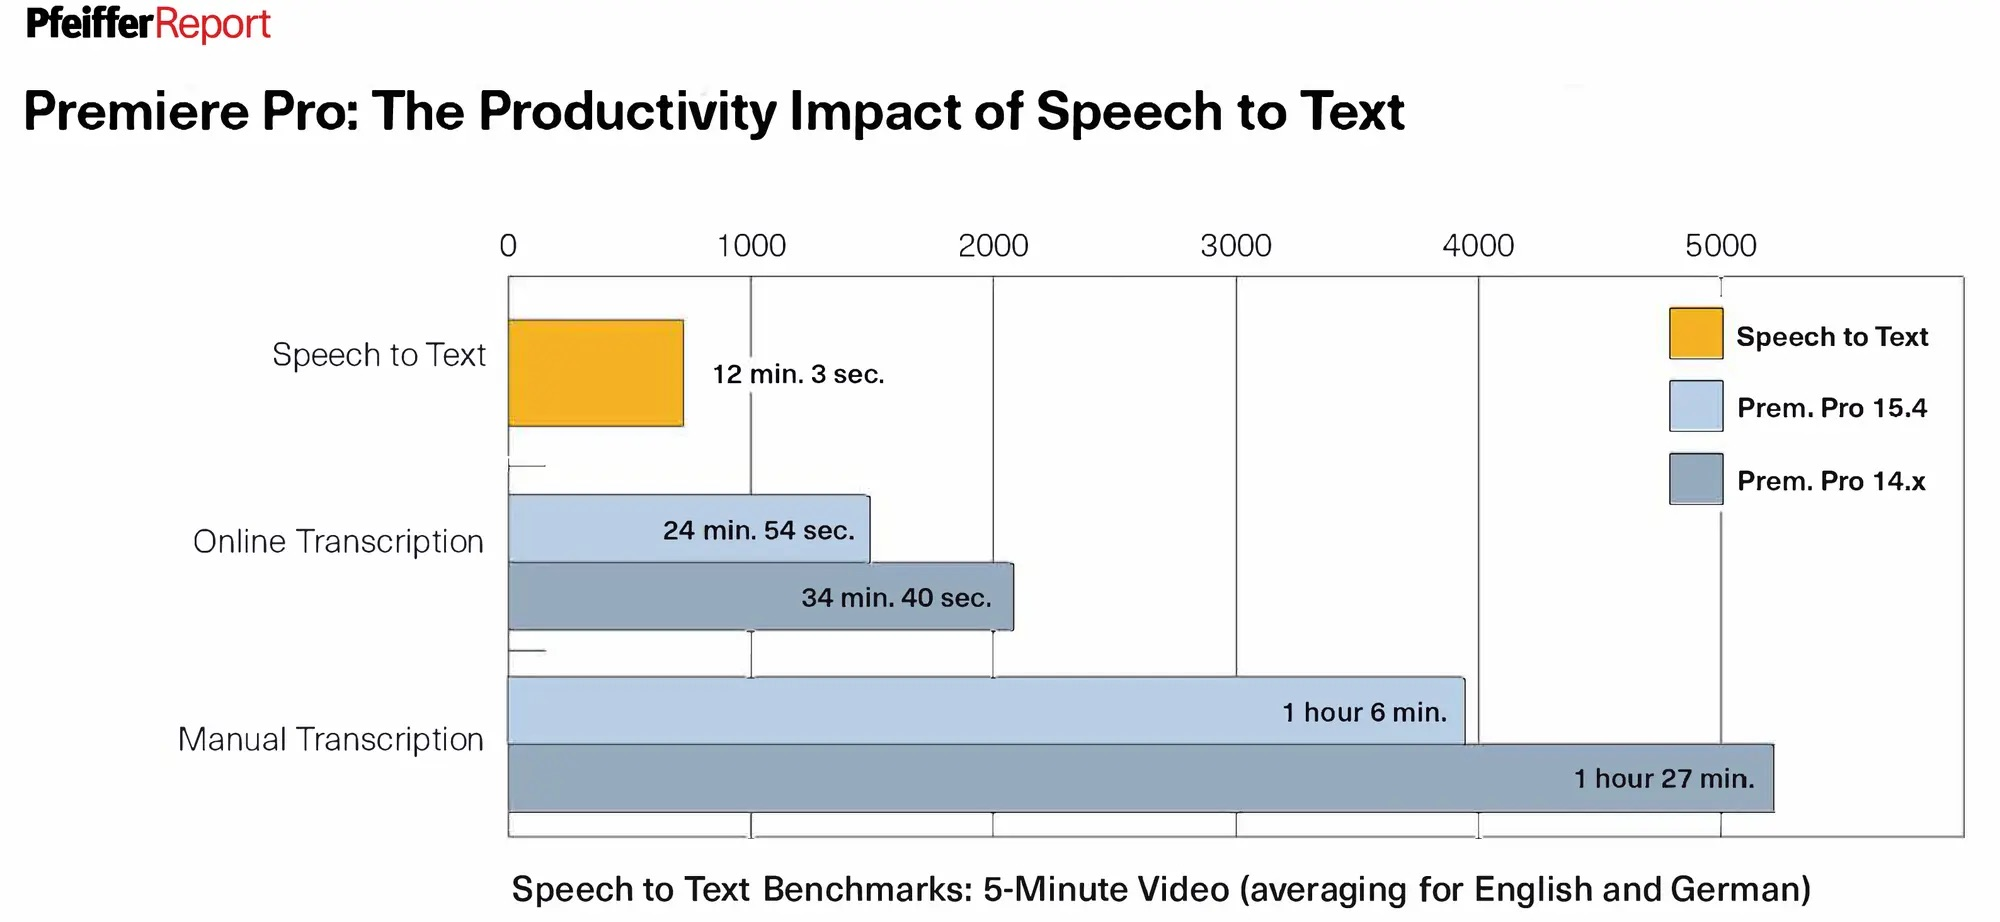 Adobe Premiere Pro Speed to text